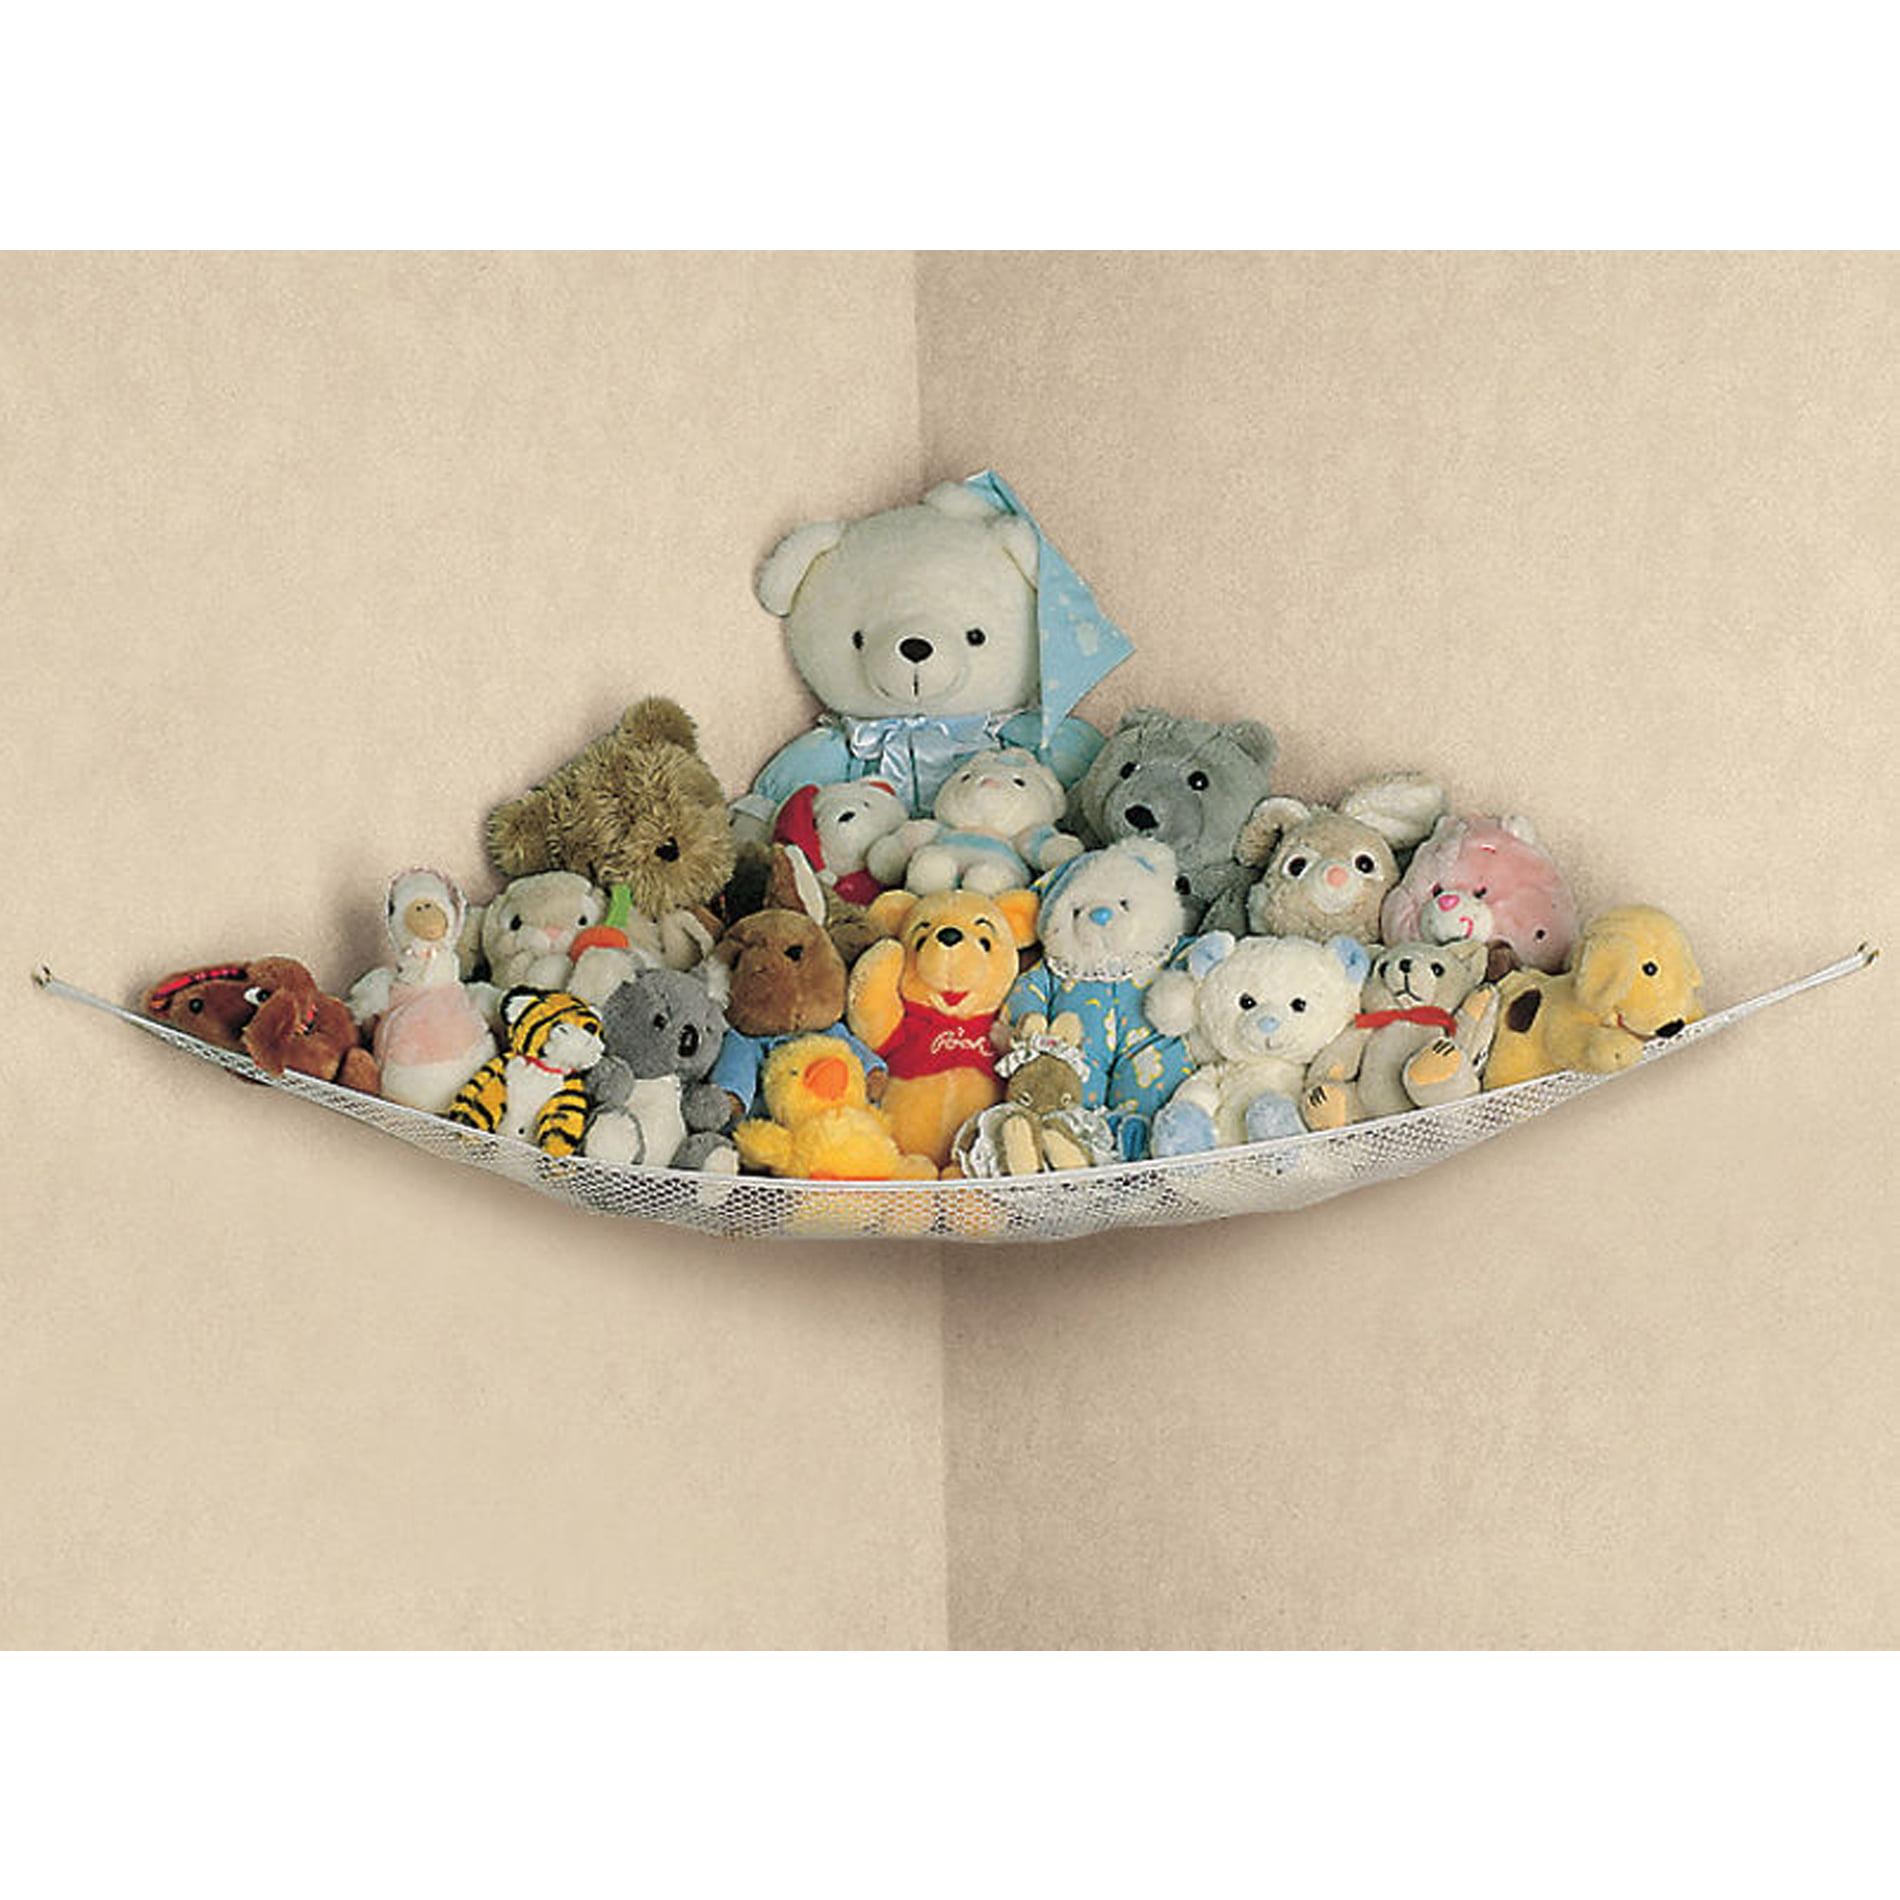 Large Kids Toy Storage Bag Organiser//Mesh Hammock Home Room Tidy For Teddy Bears